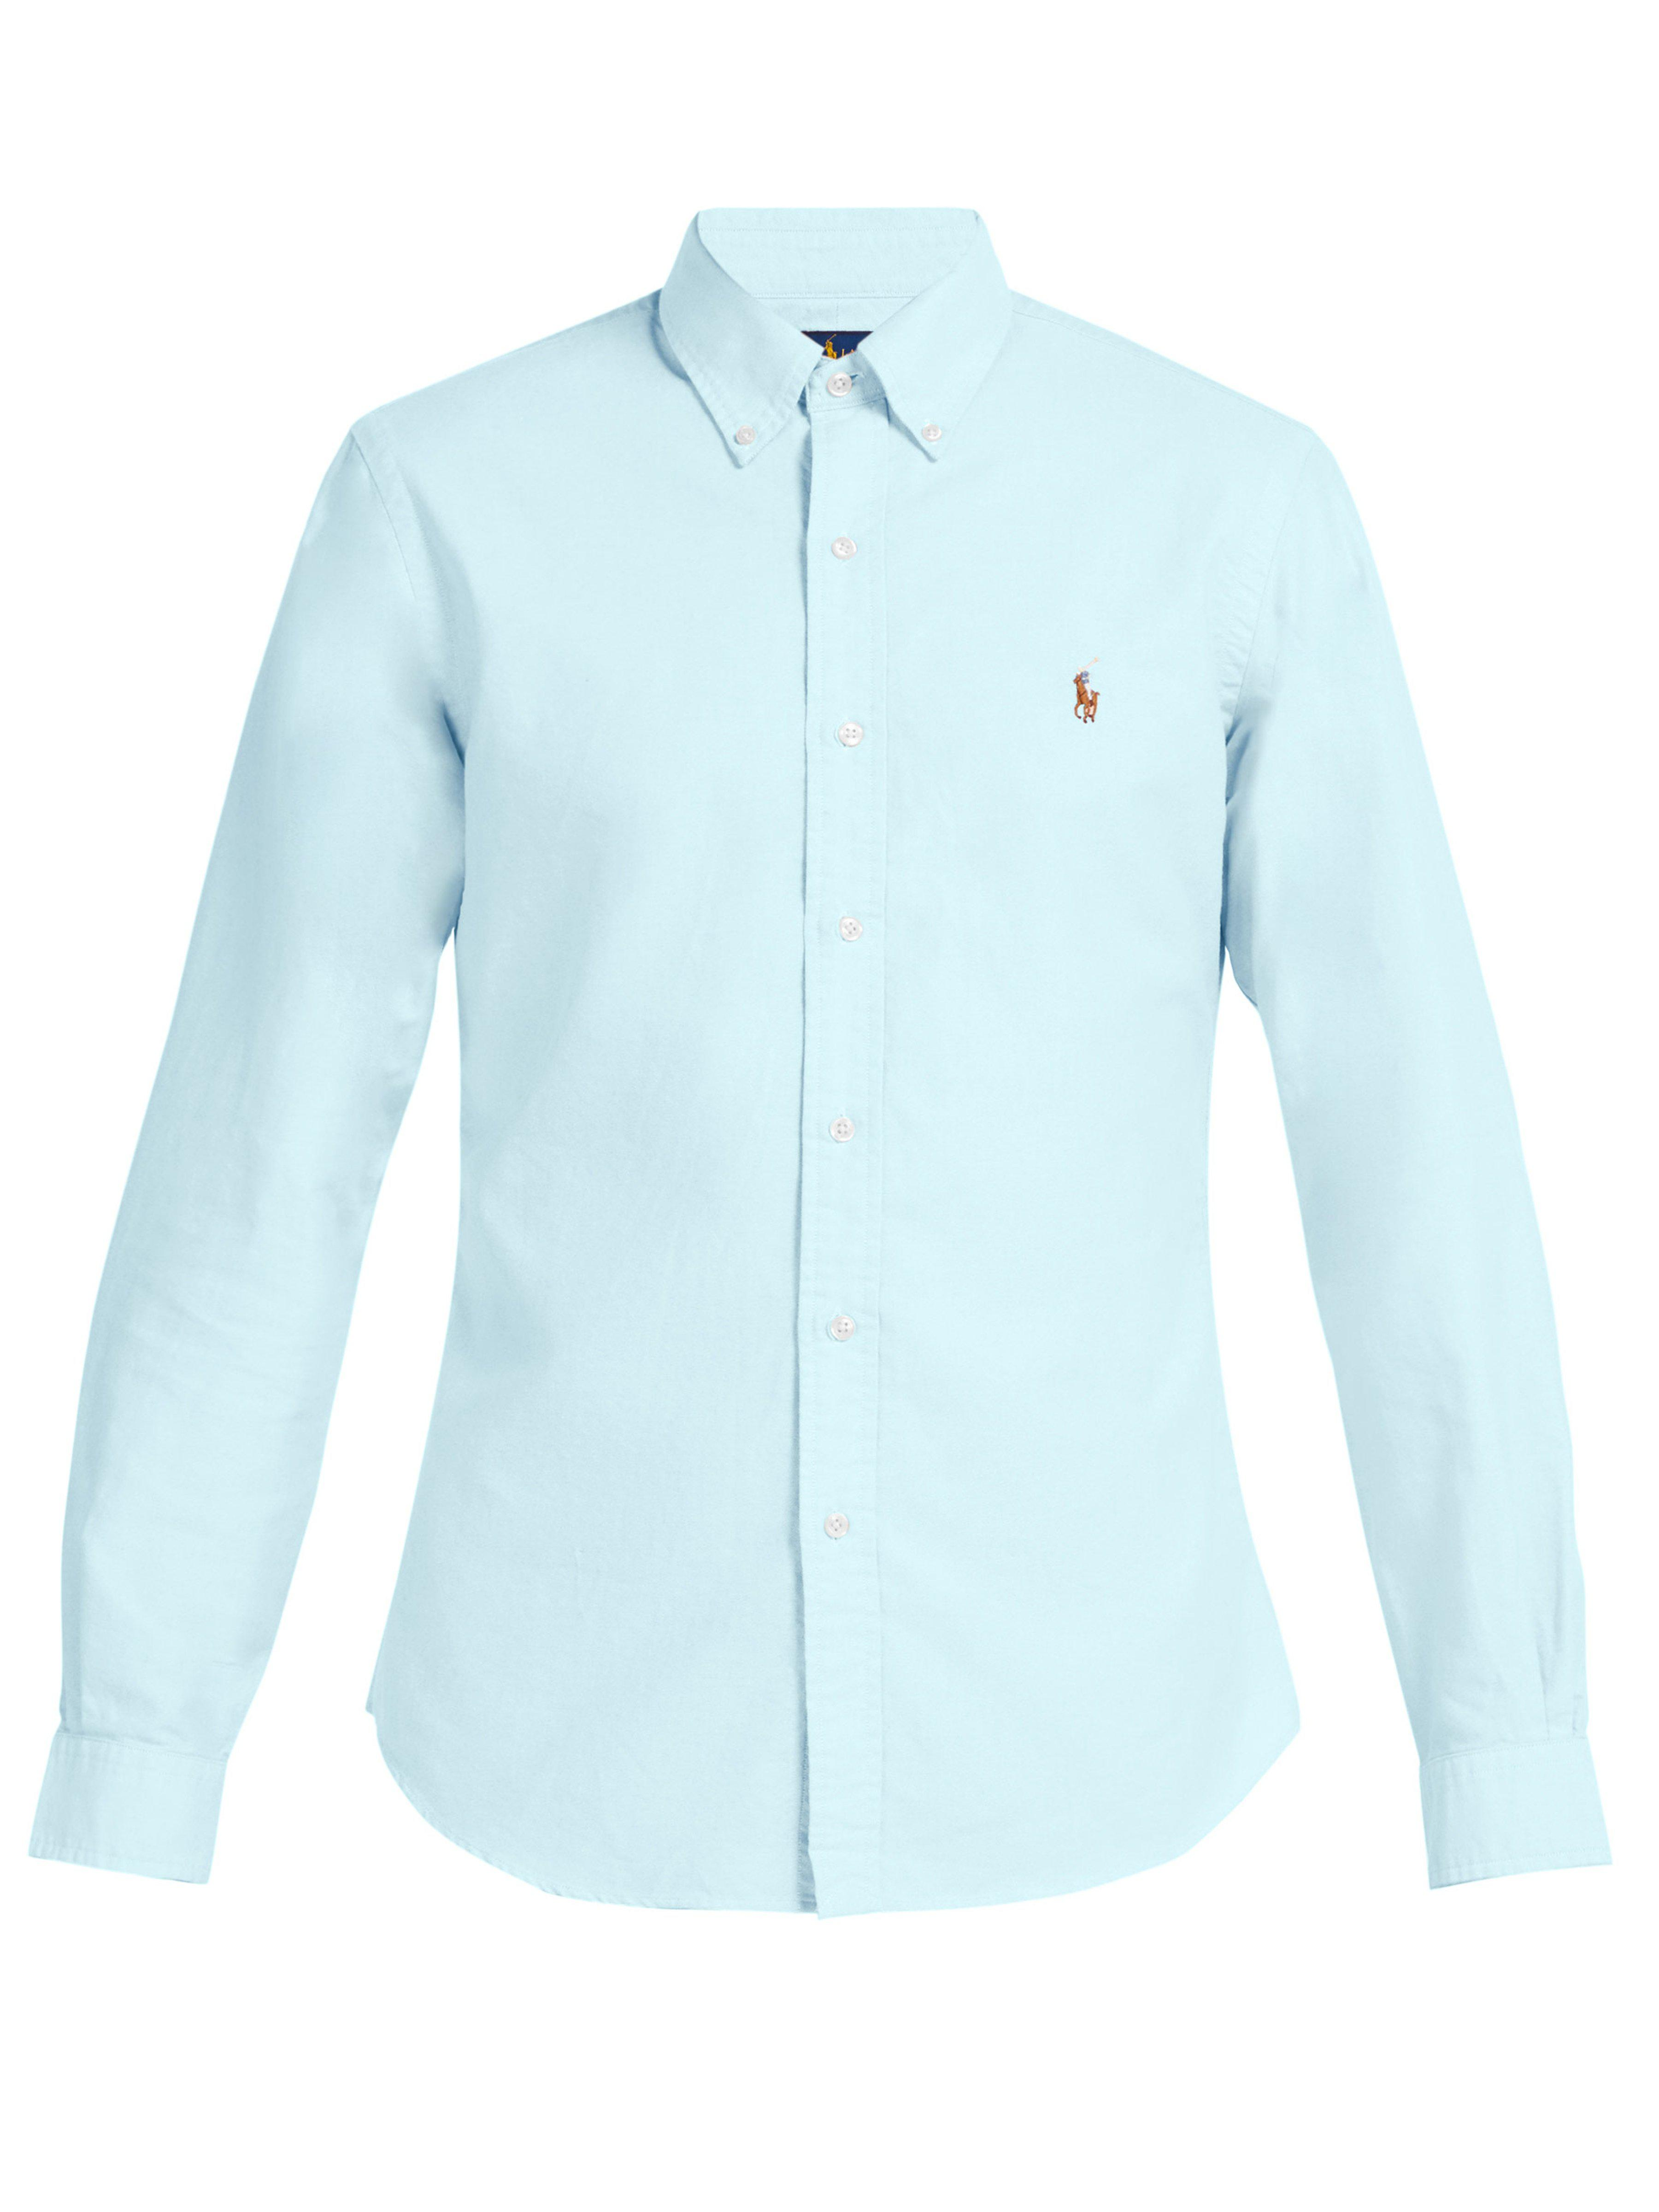 103546d7f1b Polo Ralph Lauren Slim Fit Cotton Oxford Shirt in Blue for Men - Lyst